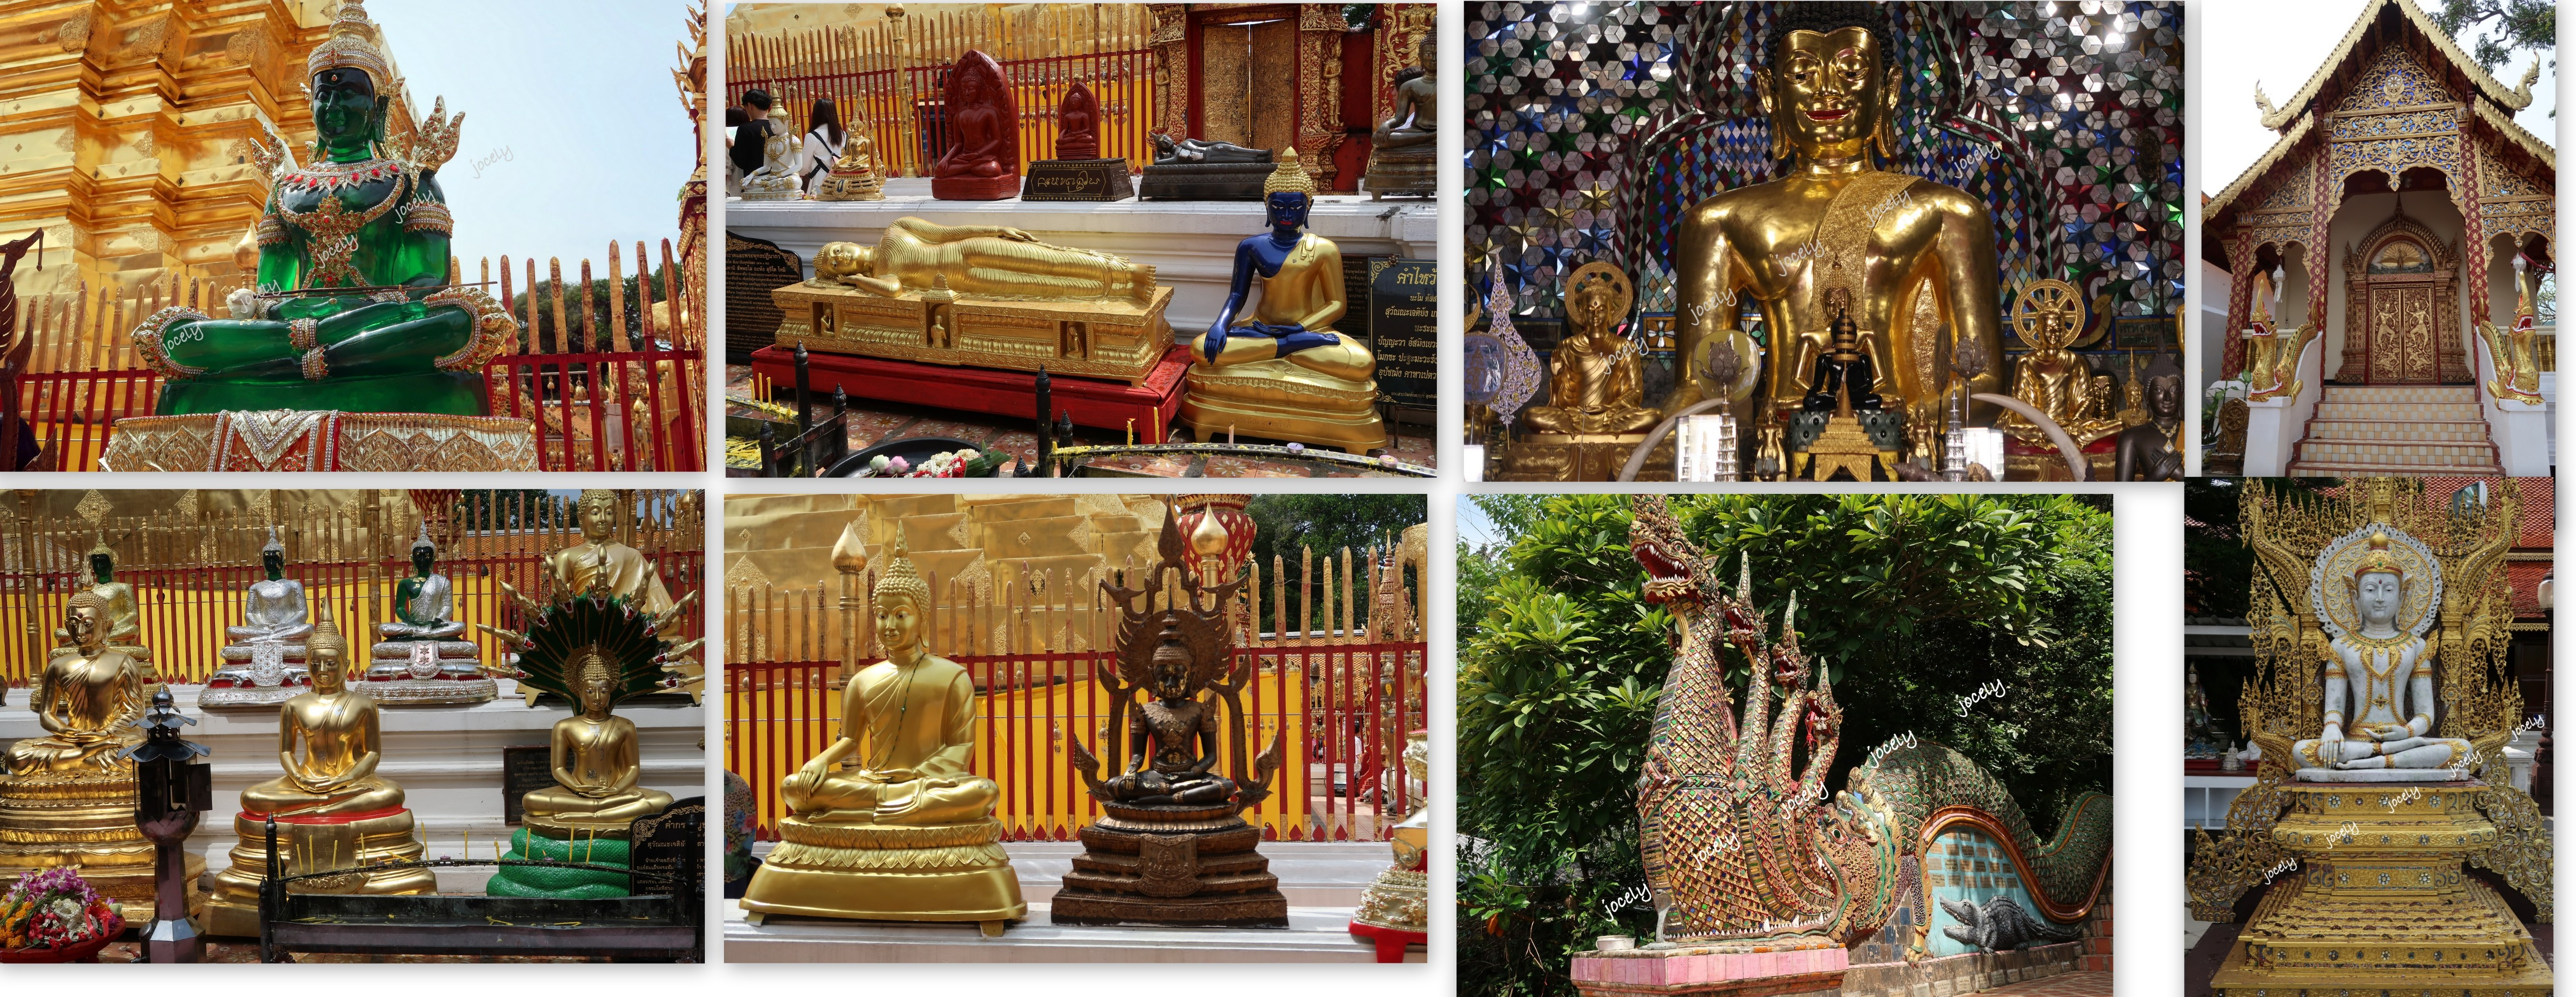 TAILANDIA-24#11-Chiang Mai1-002